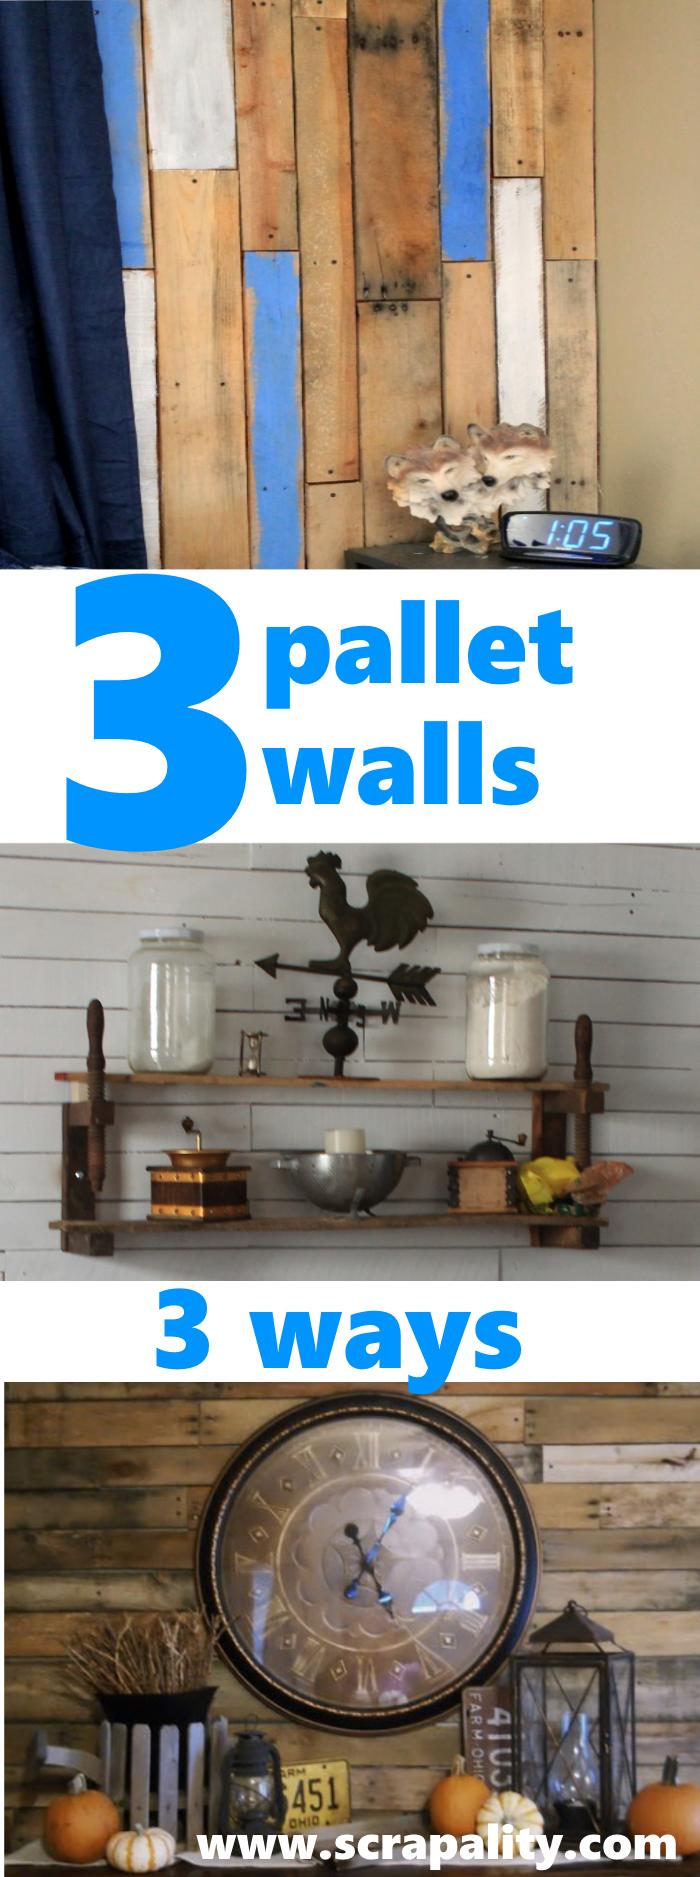 3palletwalls